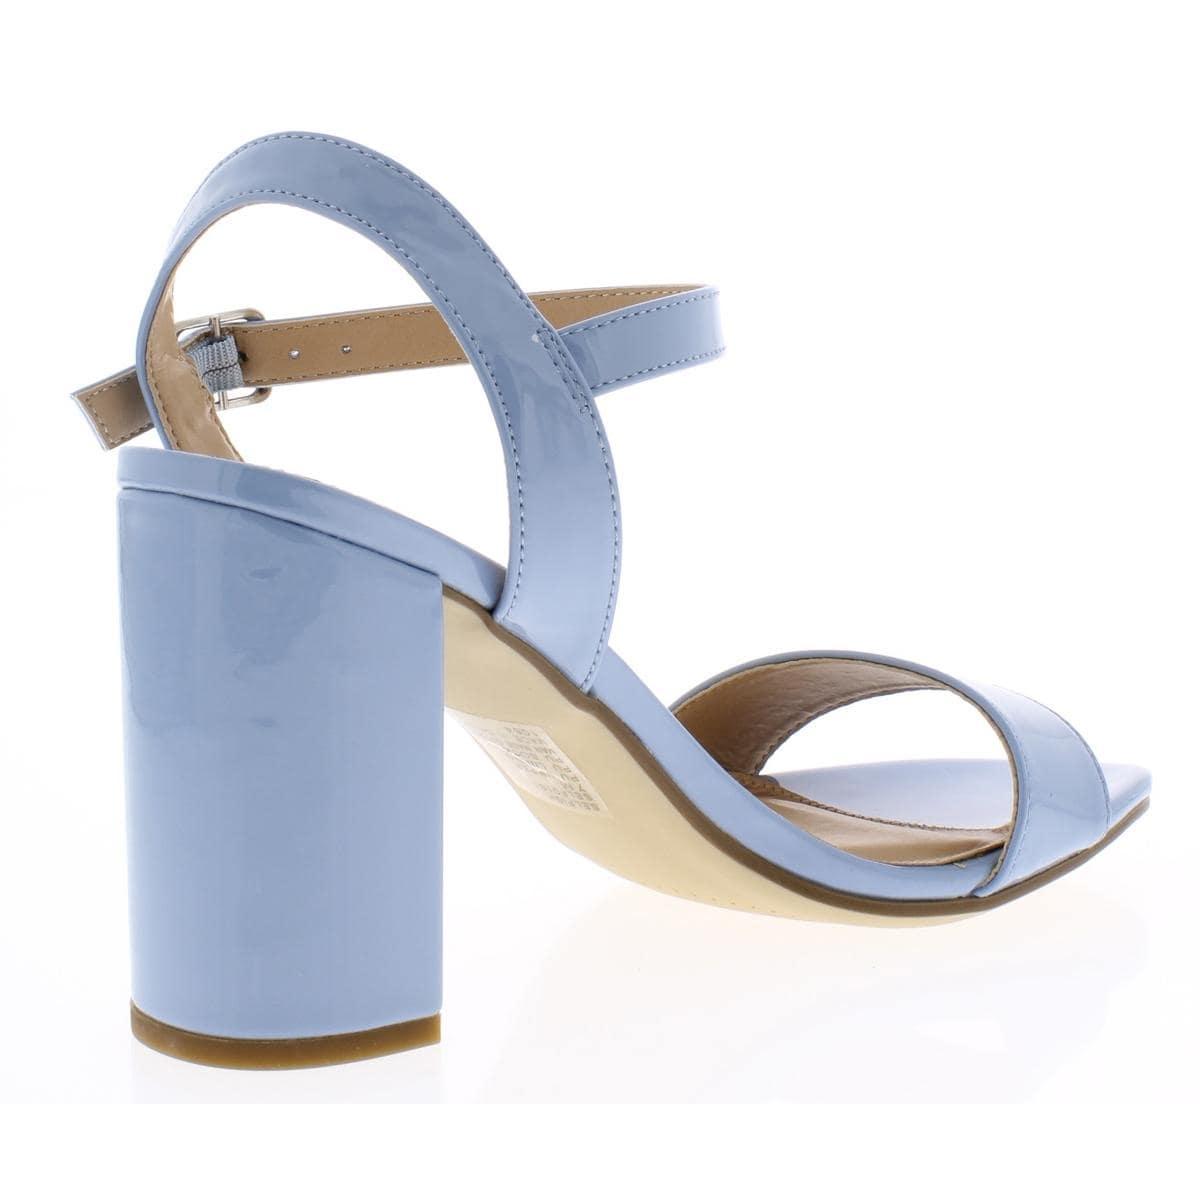 Steve Madden Womens Selfish Dress Sandals Block Heel